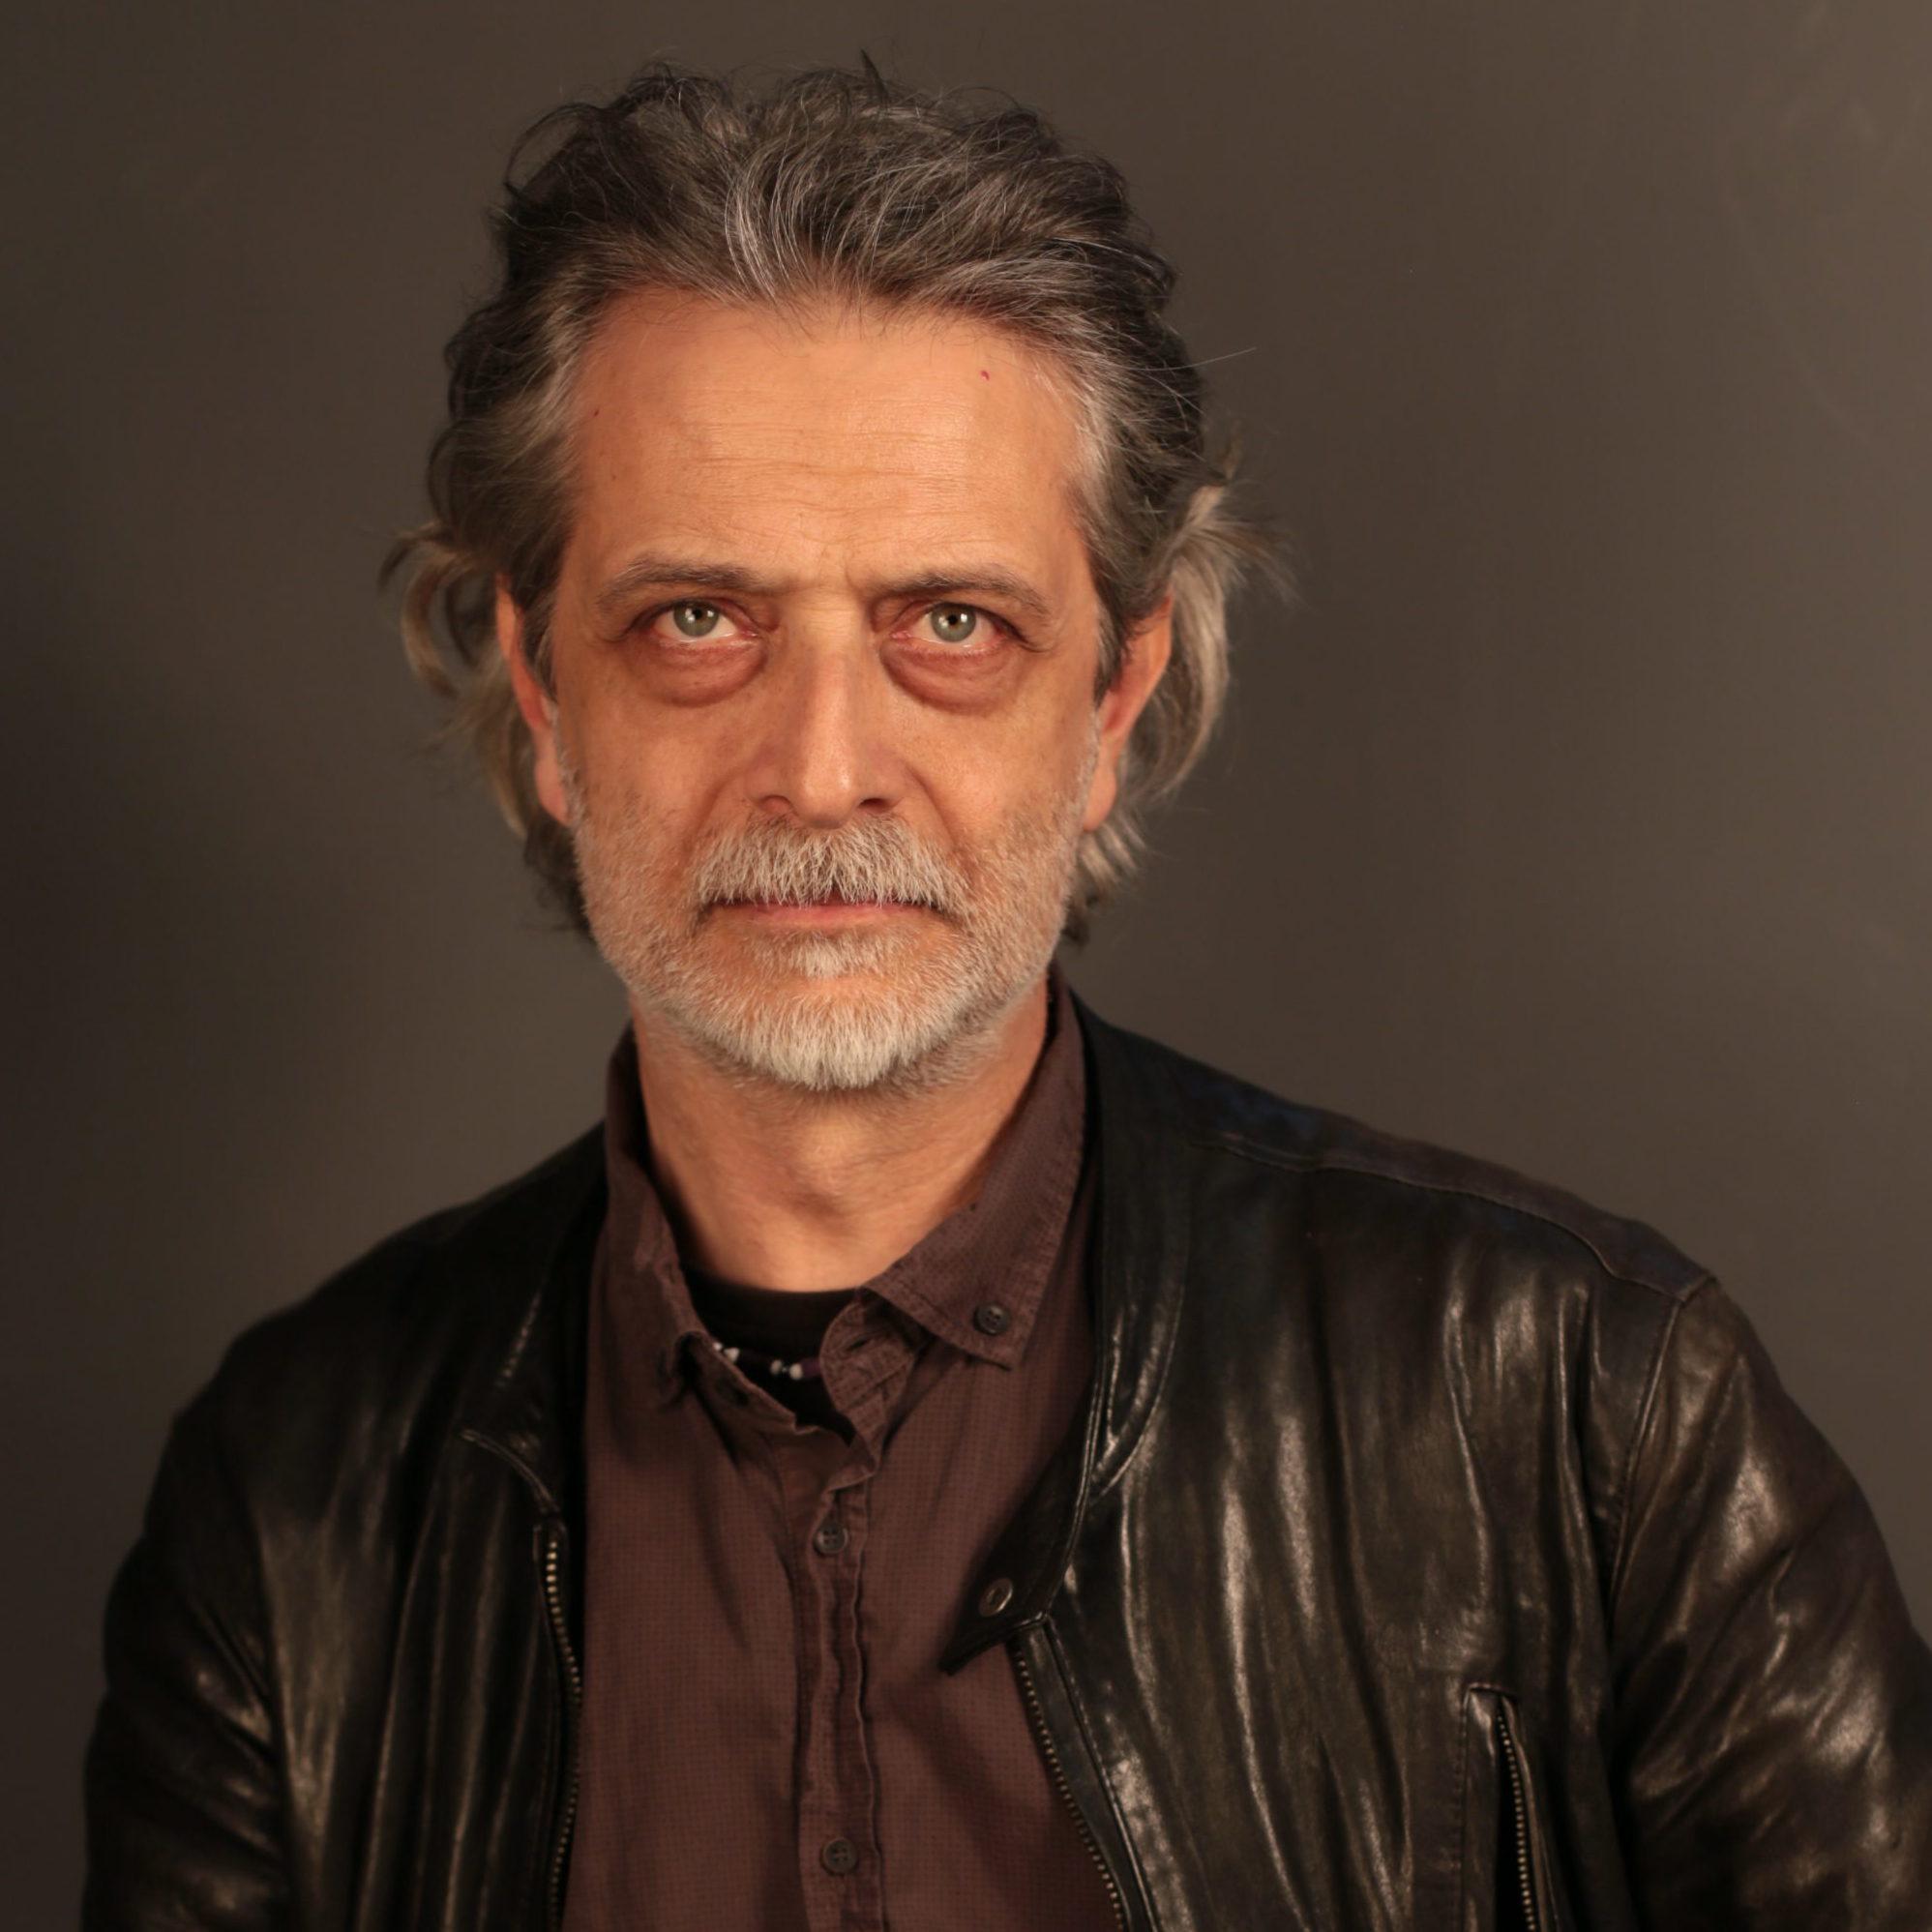 Angelo Iacovitti